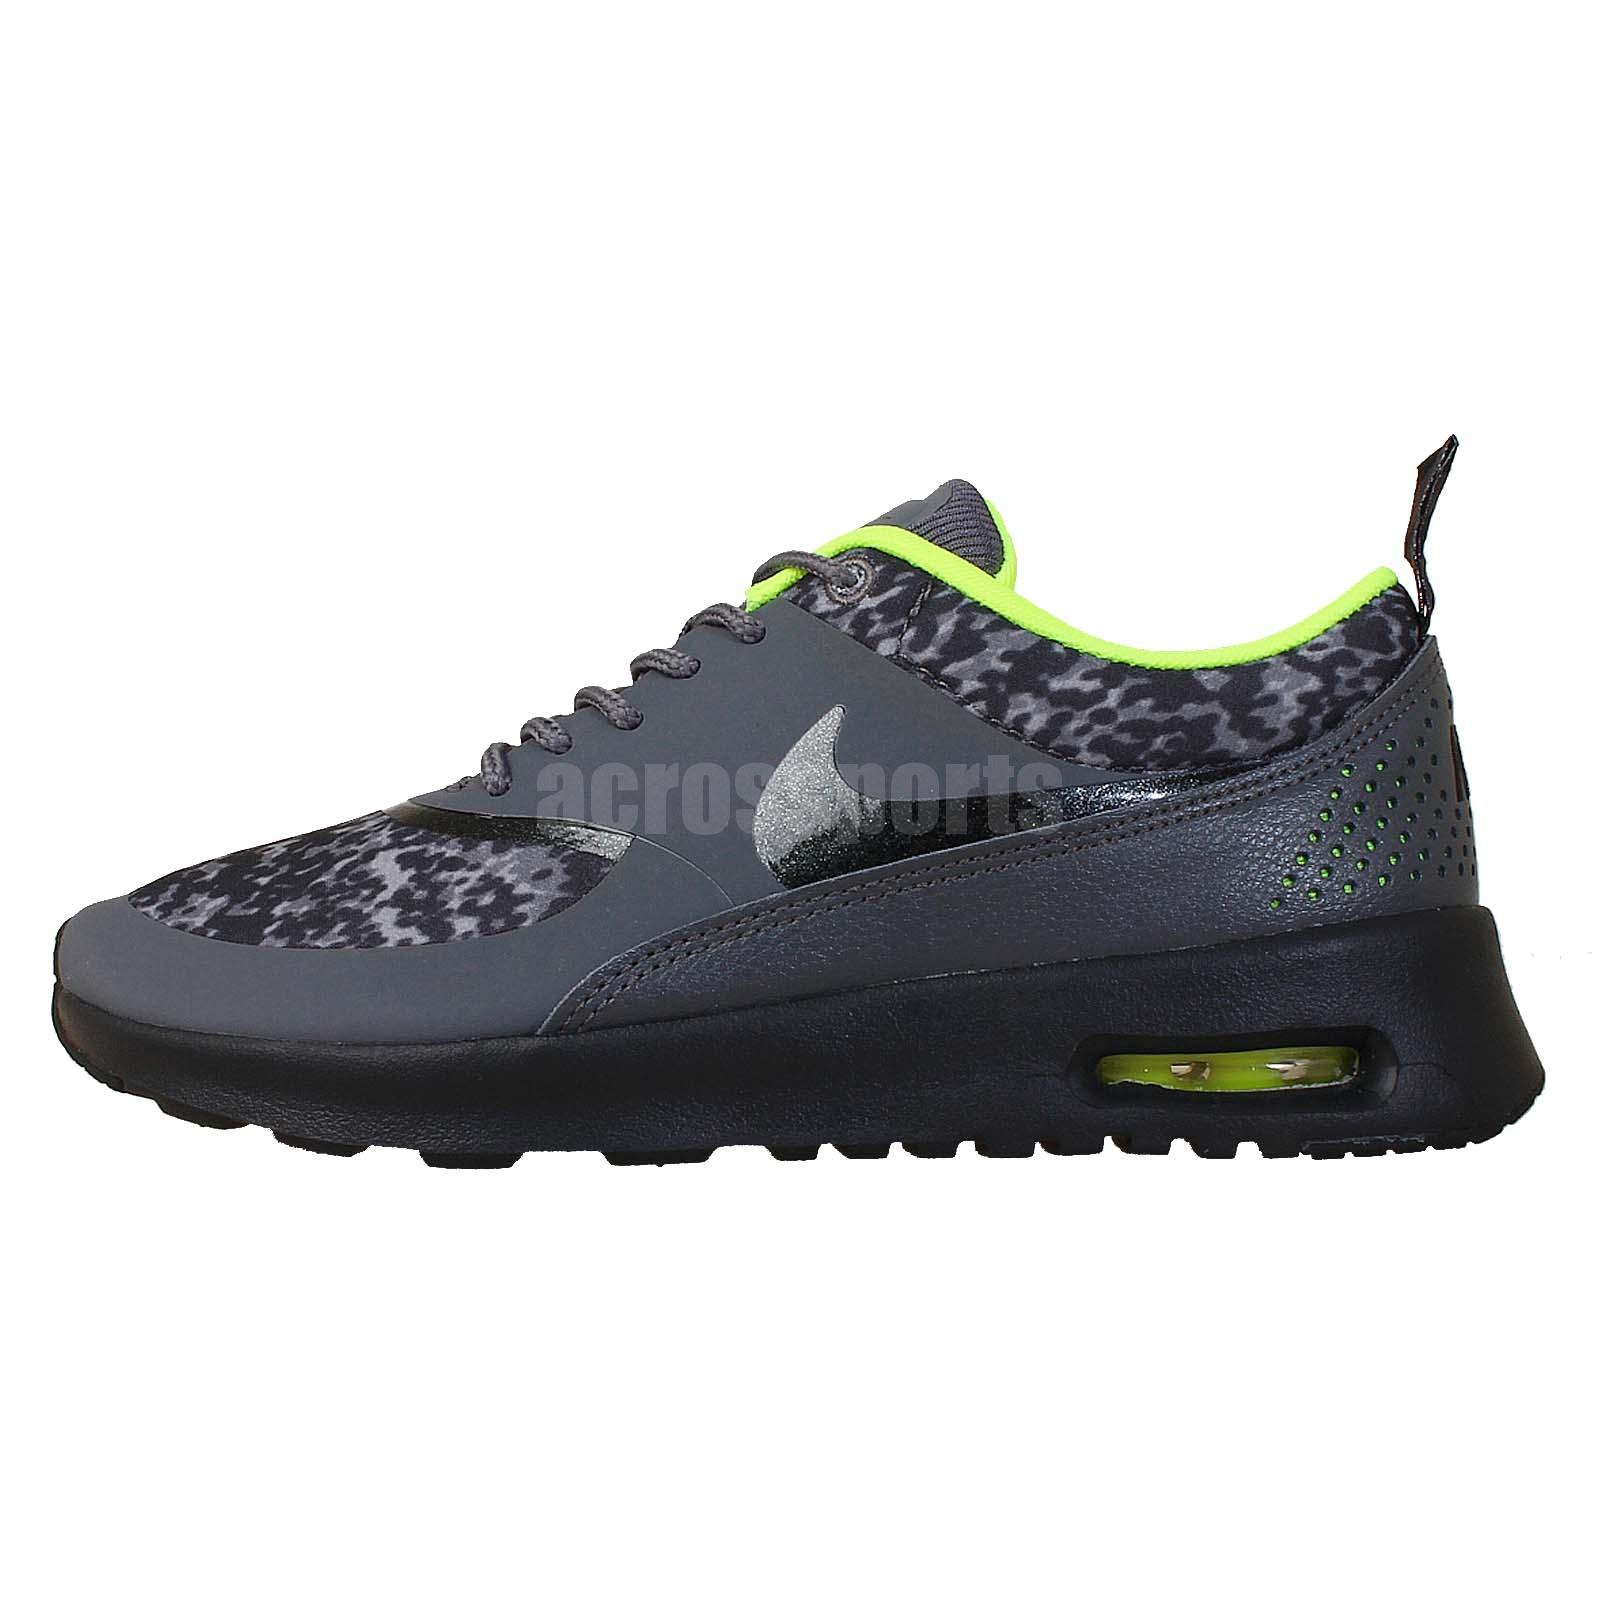 wmns nike air max thea print grey volt leopard womens running shoes 599408 006 ebay